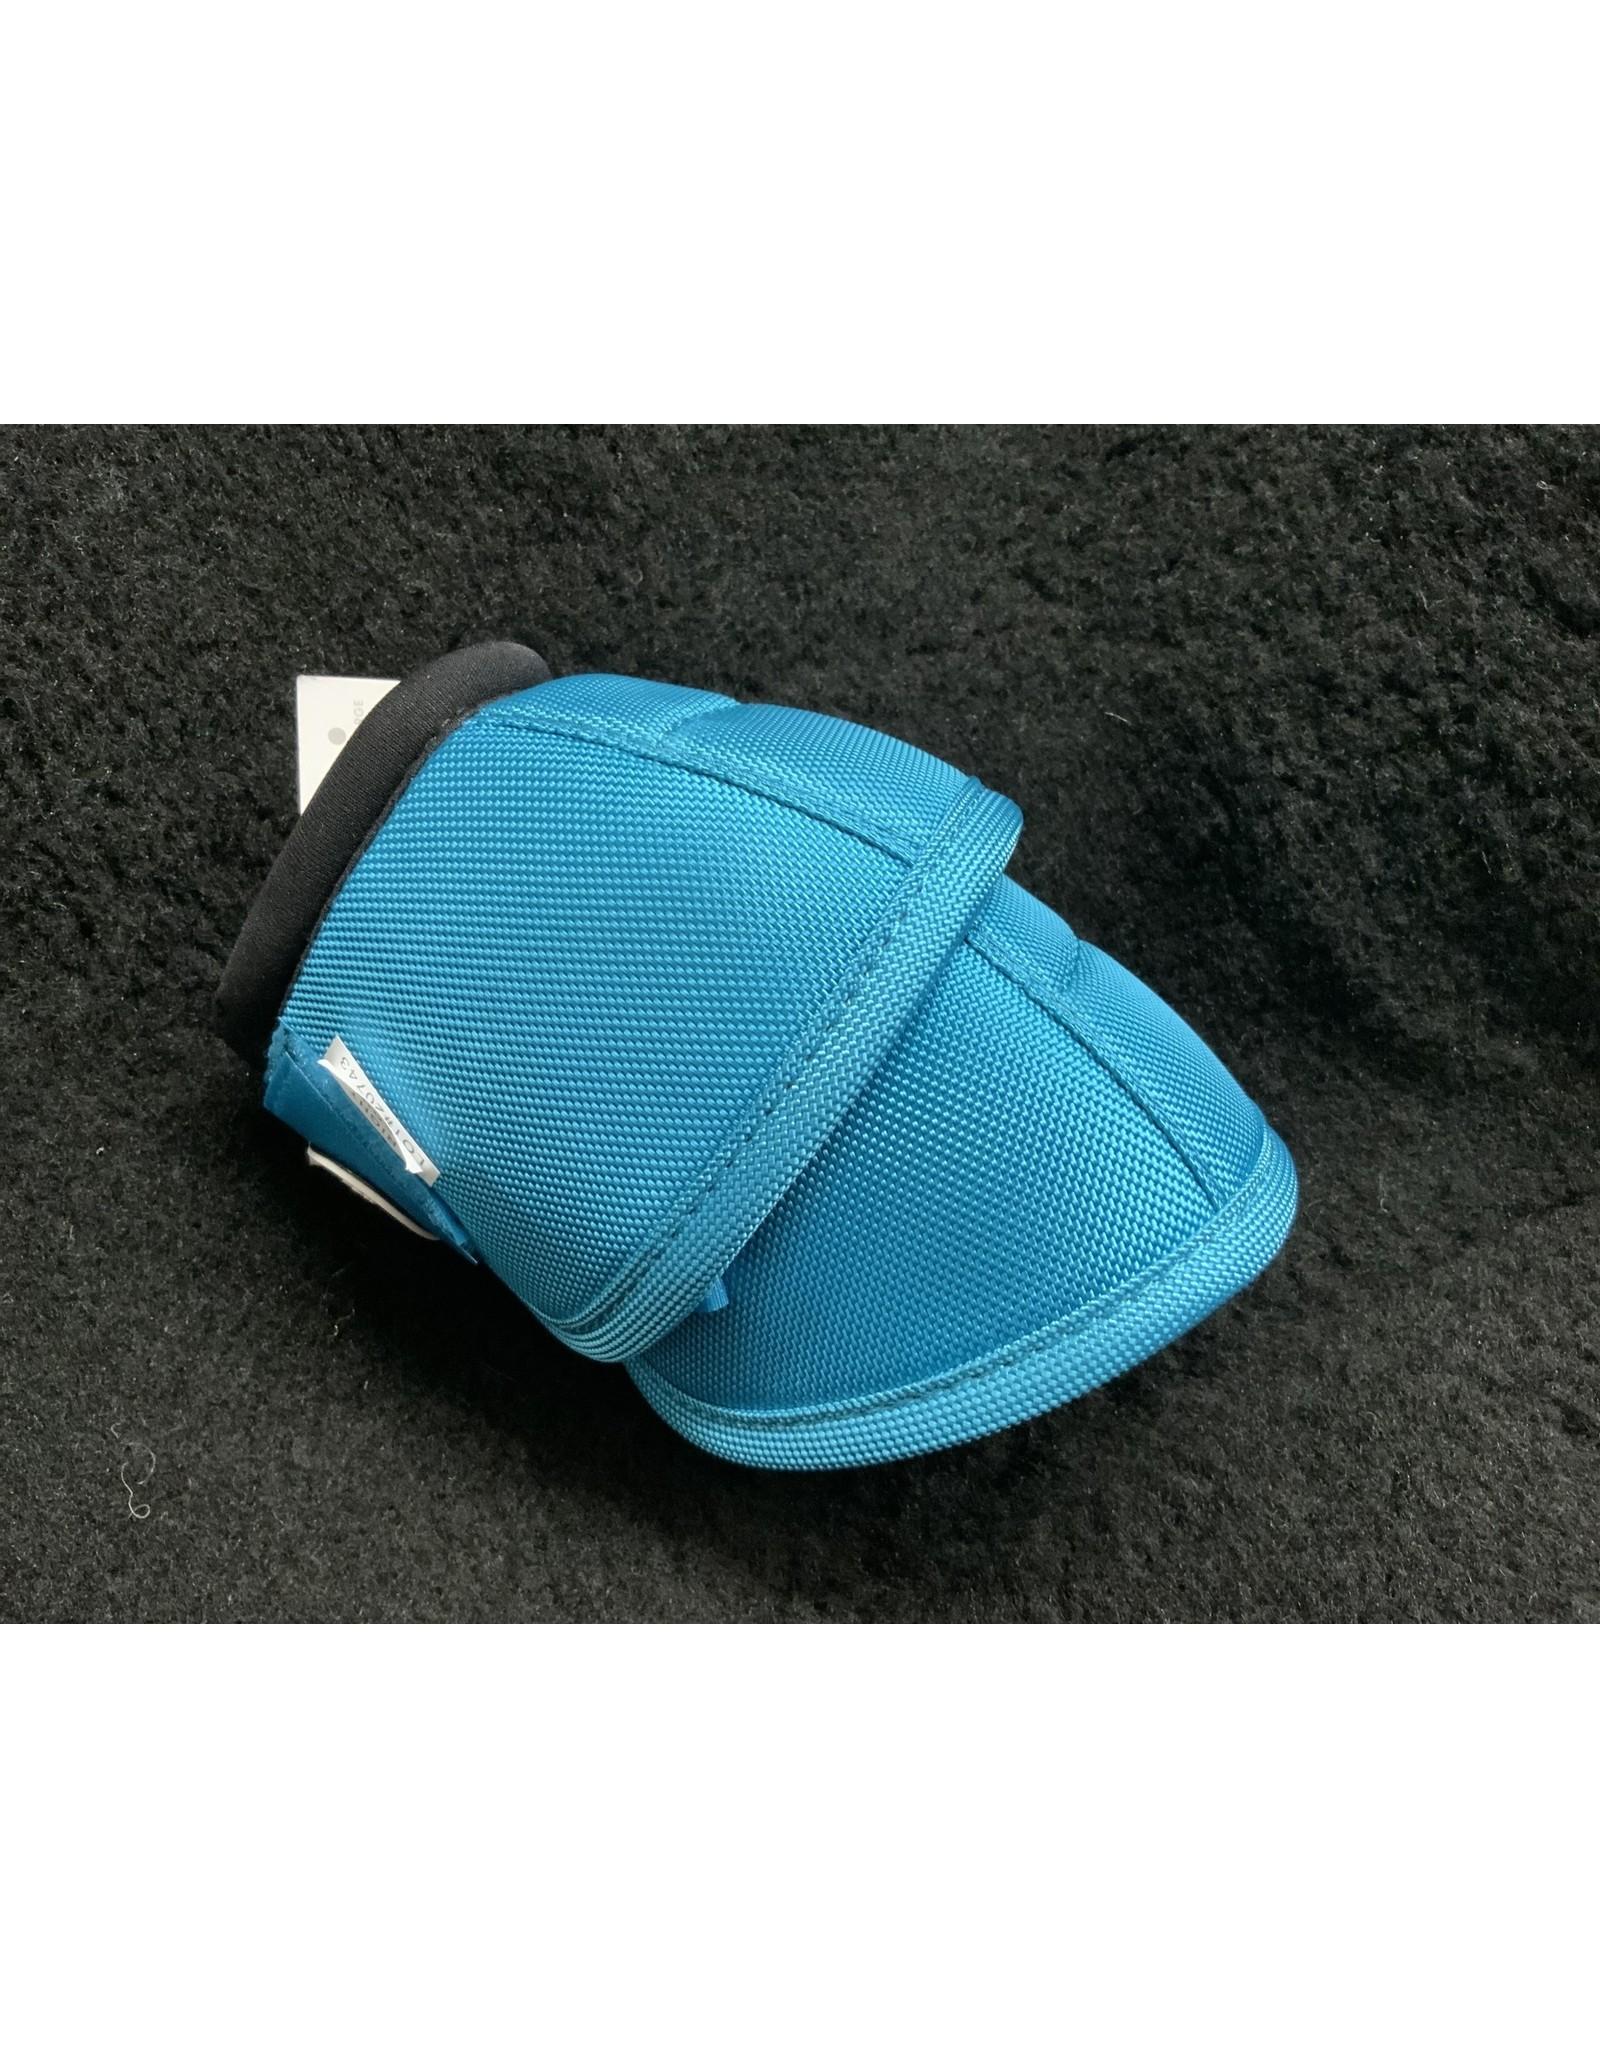 Bell Boots - Ballistic - Large - #BB253-PAC BLUE